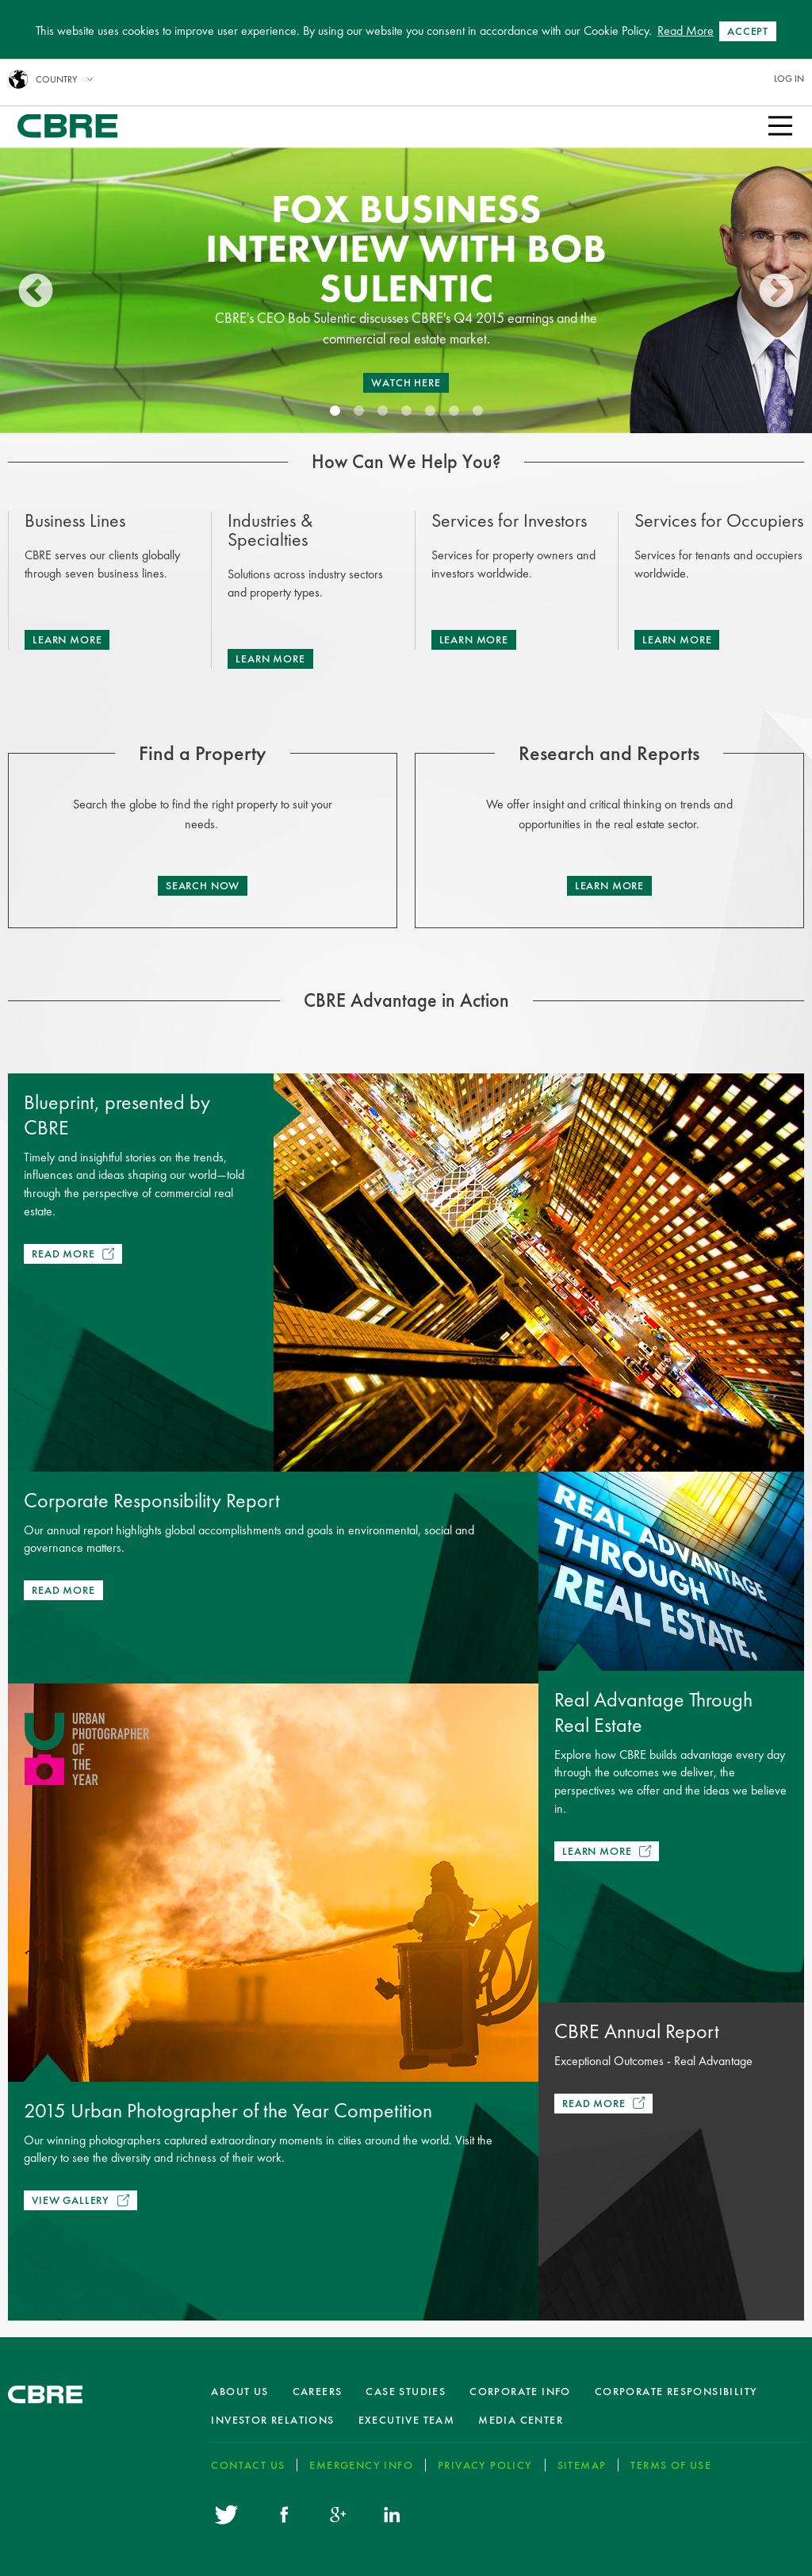 CBRE Competitors, Revenue and Employees - Owler Company Profile